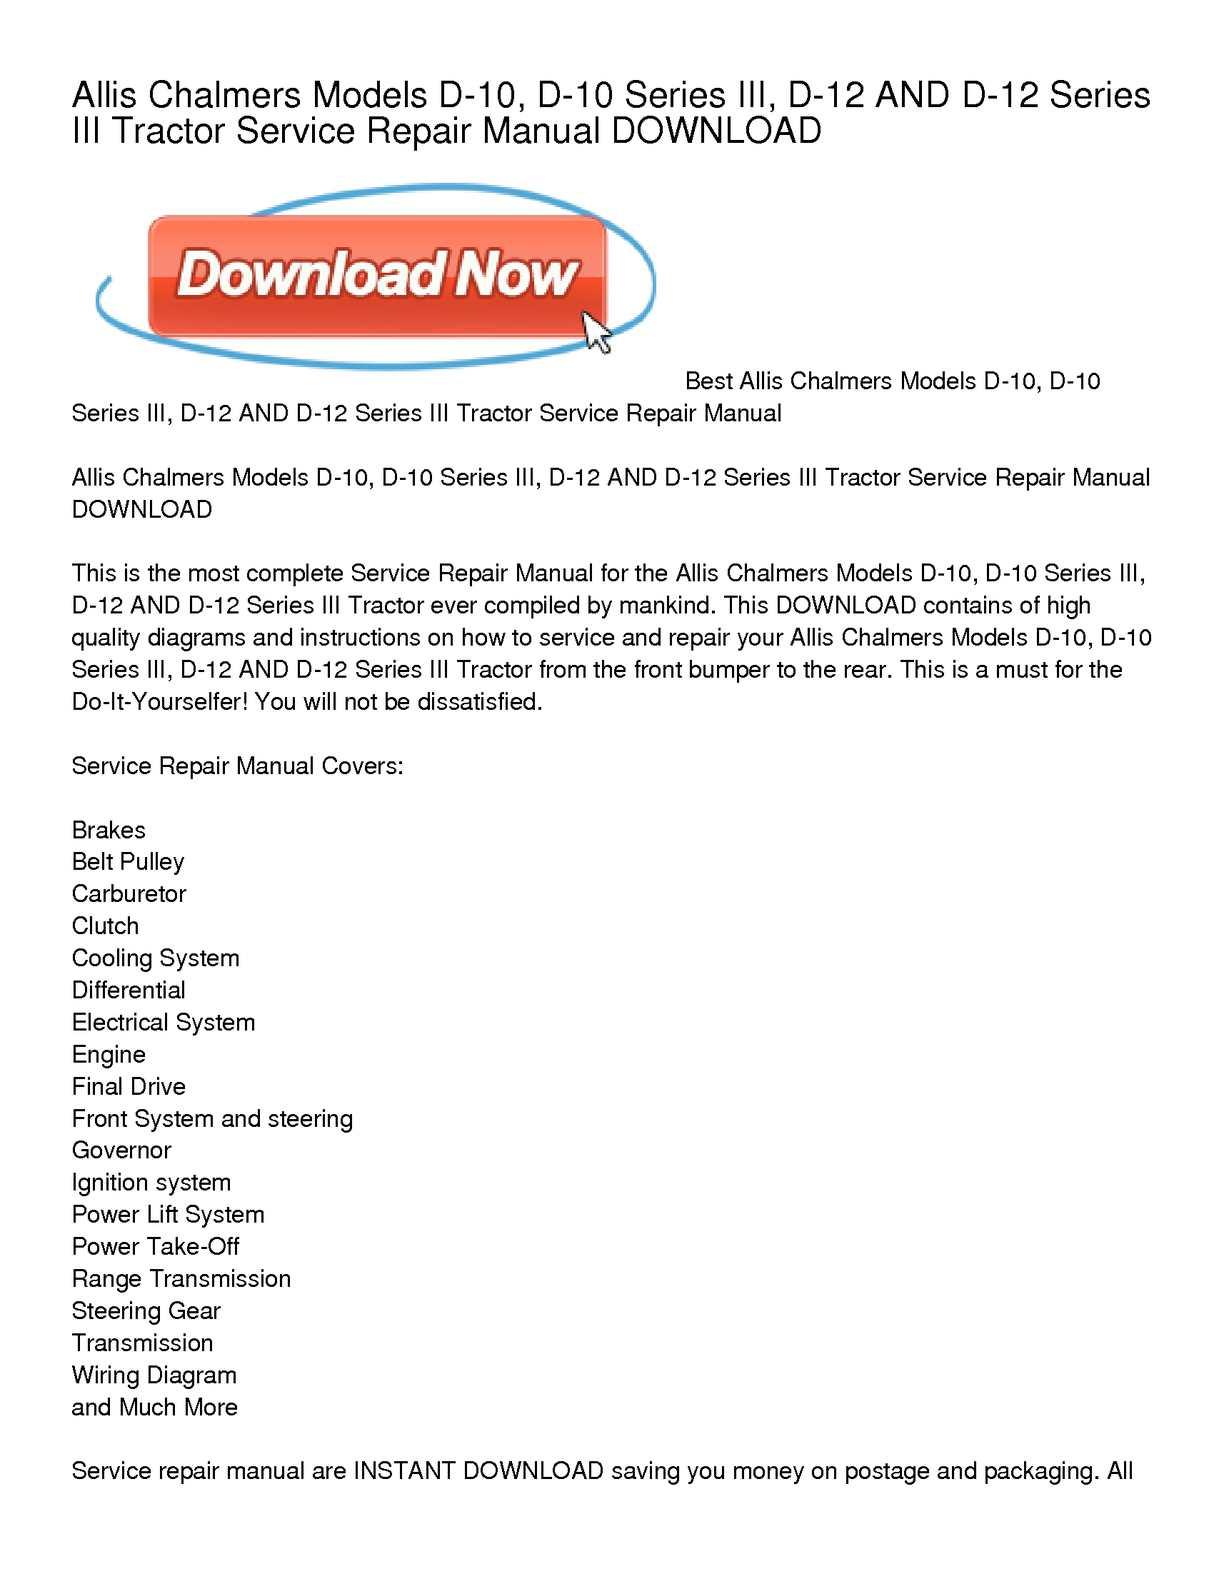 Calamo Allis Chalmers Models D 10 Series Iii 12 And Lawn Mower Wiring Diagram Tractor Service Repair Manual Download